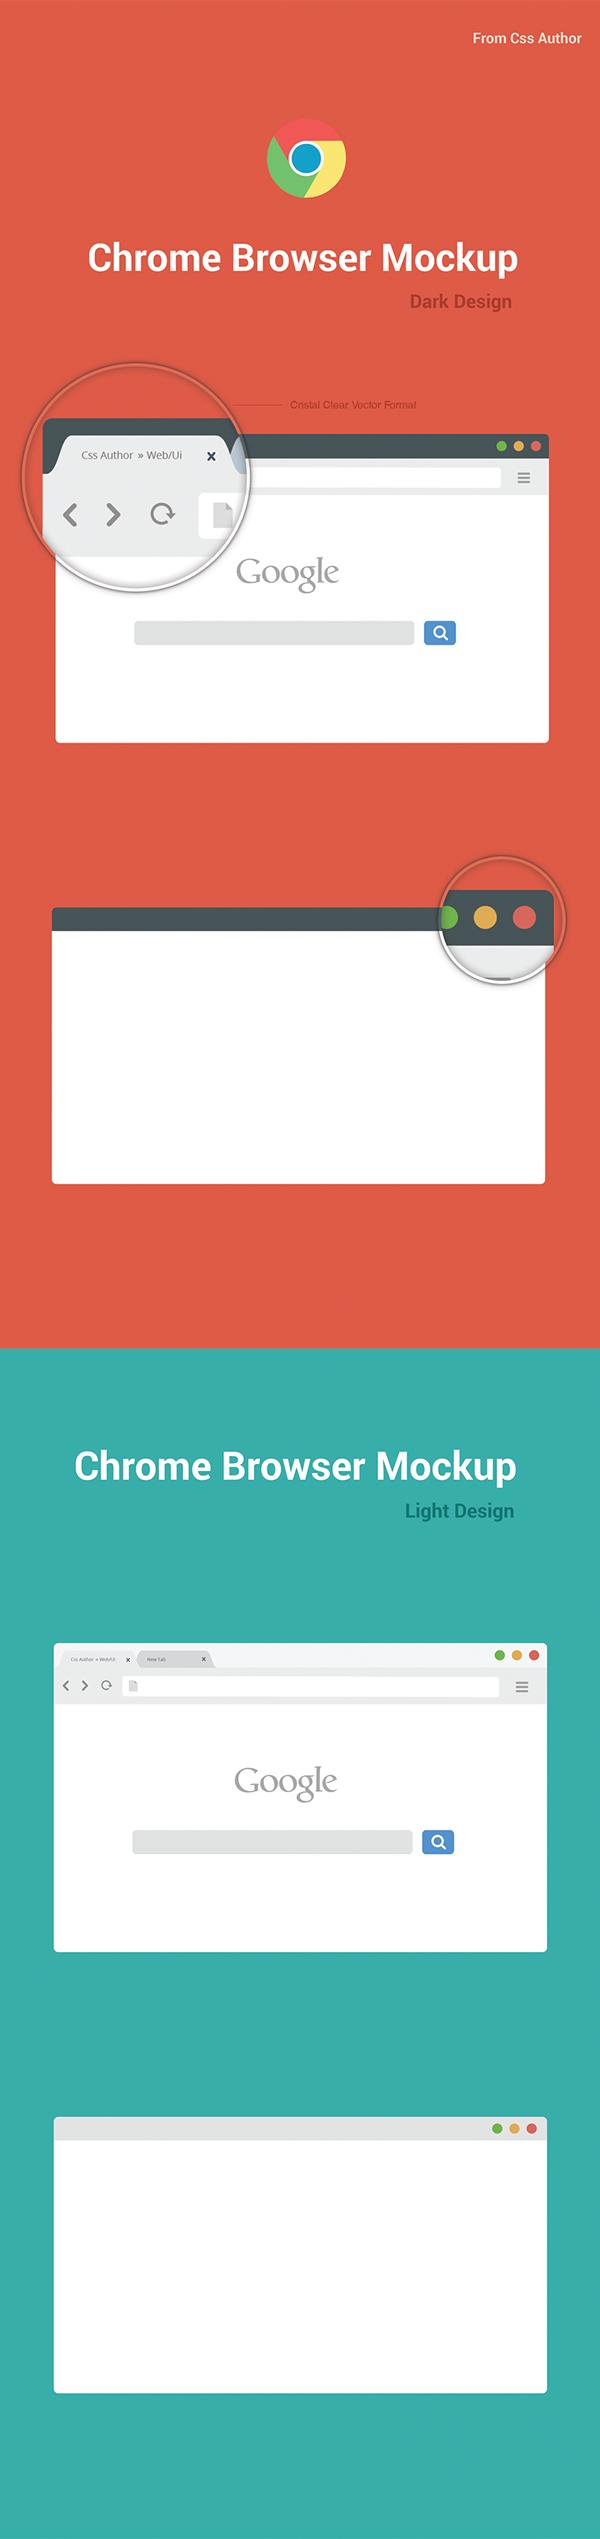 free chrome browser mockup design template vector on behance